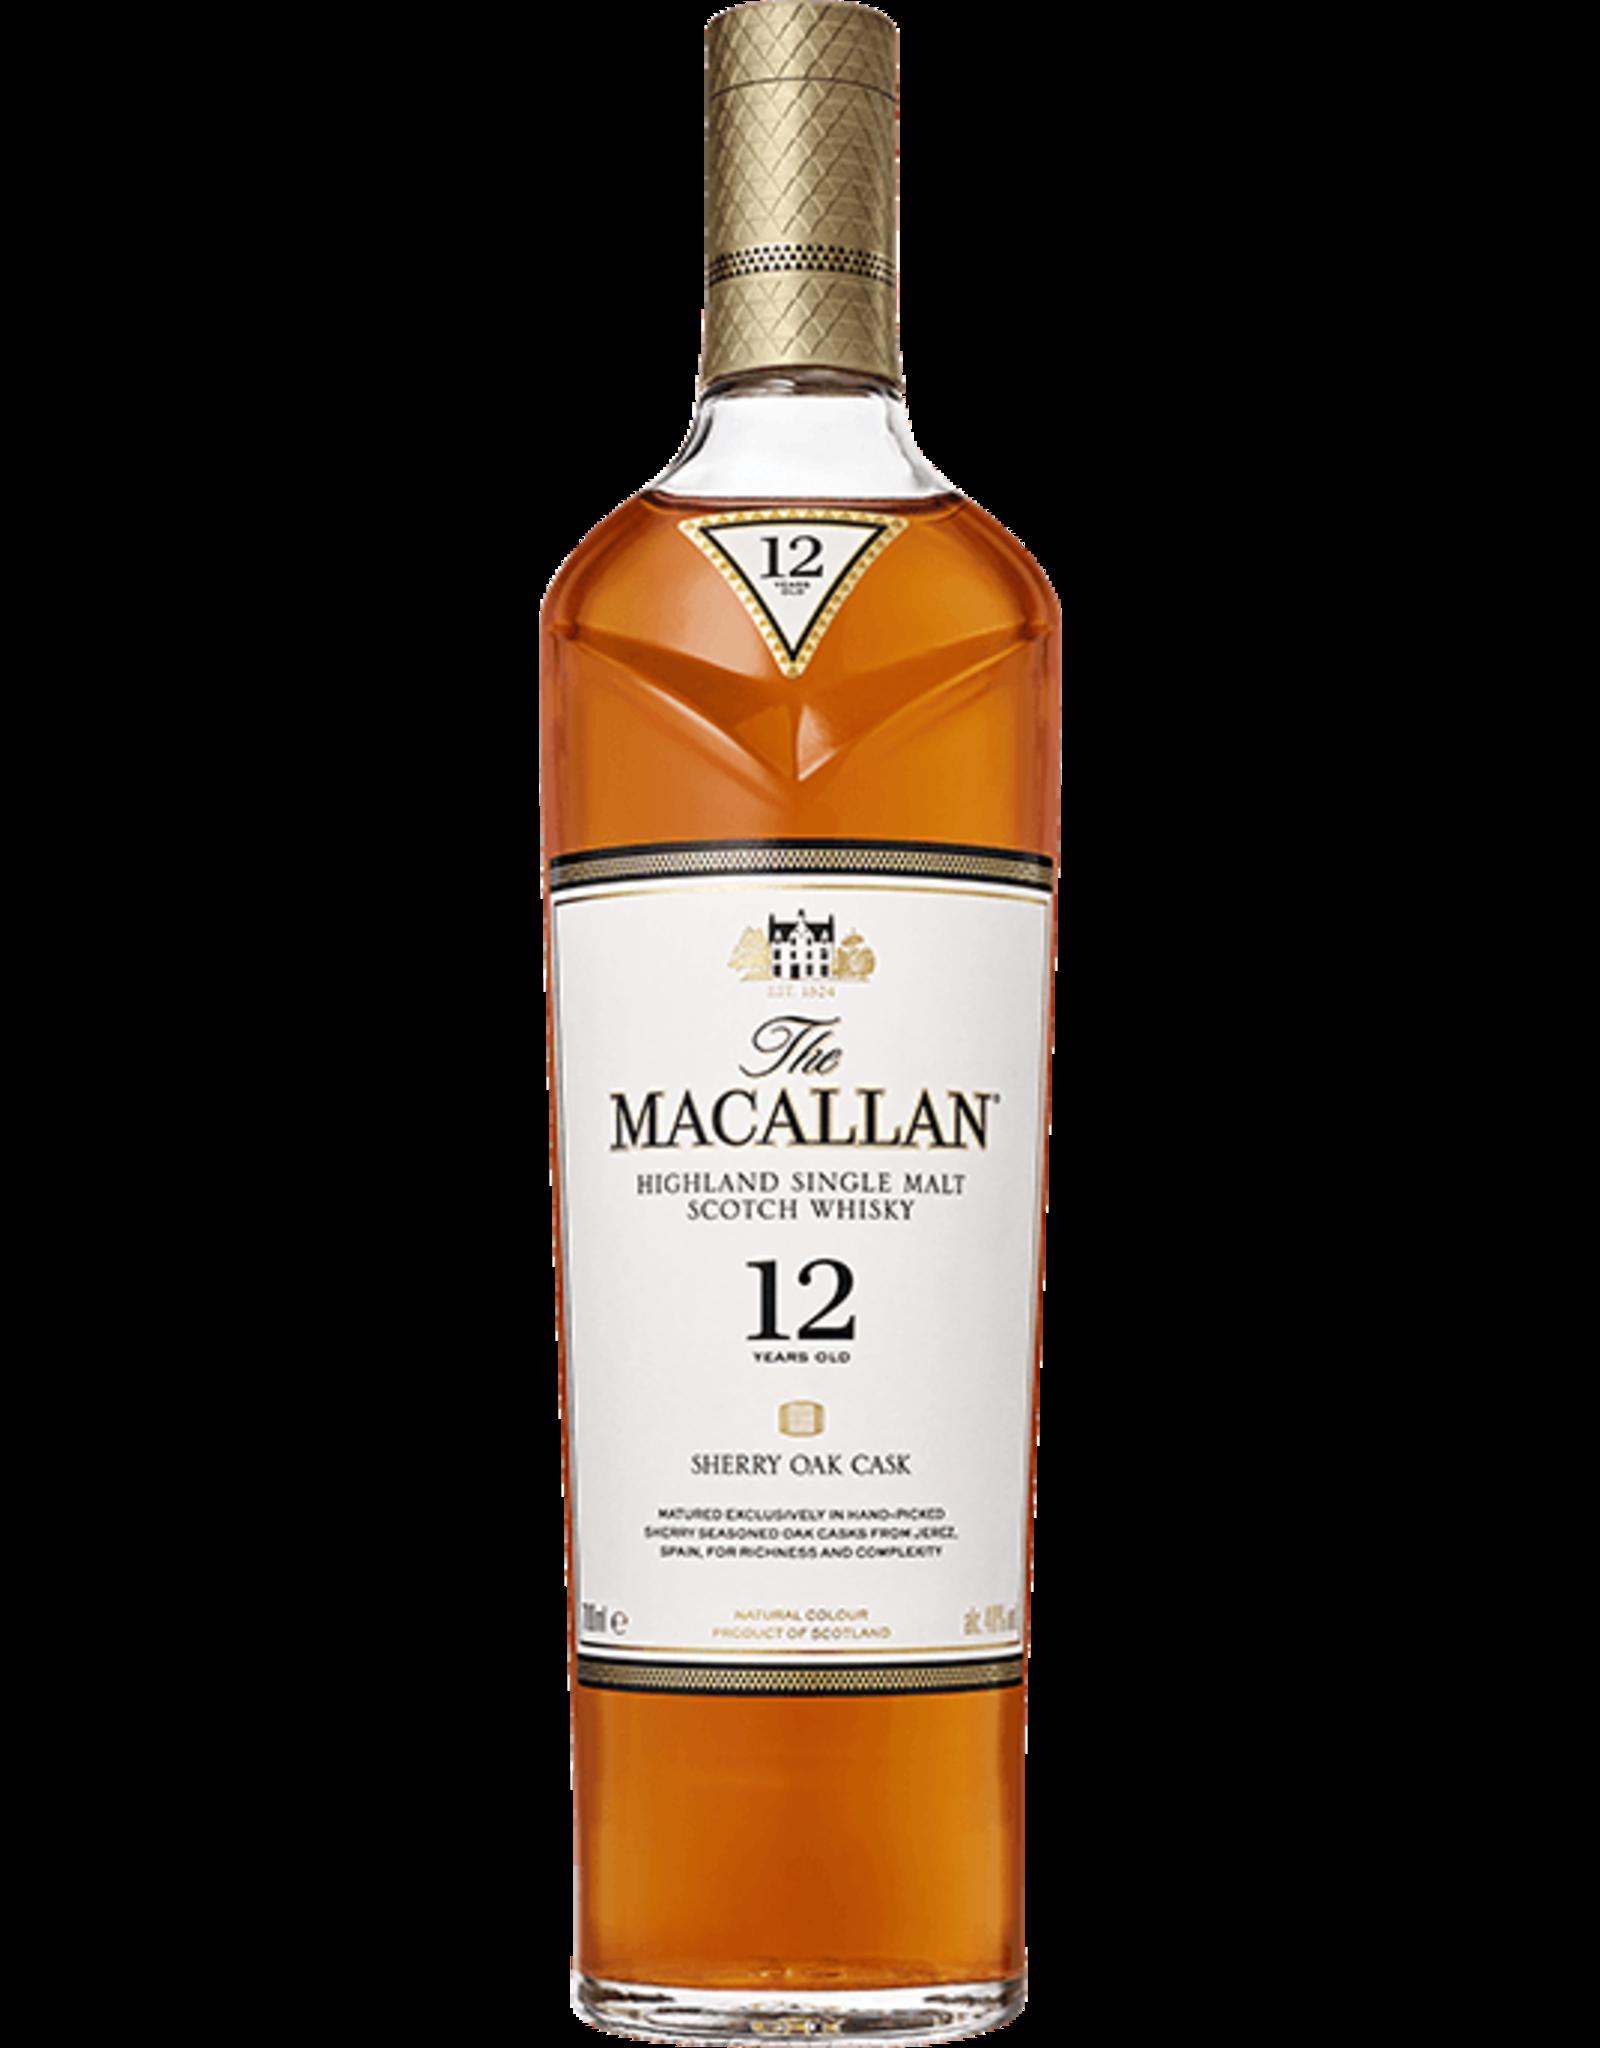 The Macallan 12 Year Sherry Cask